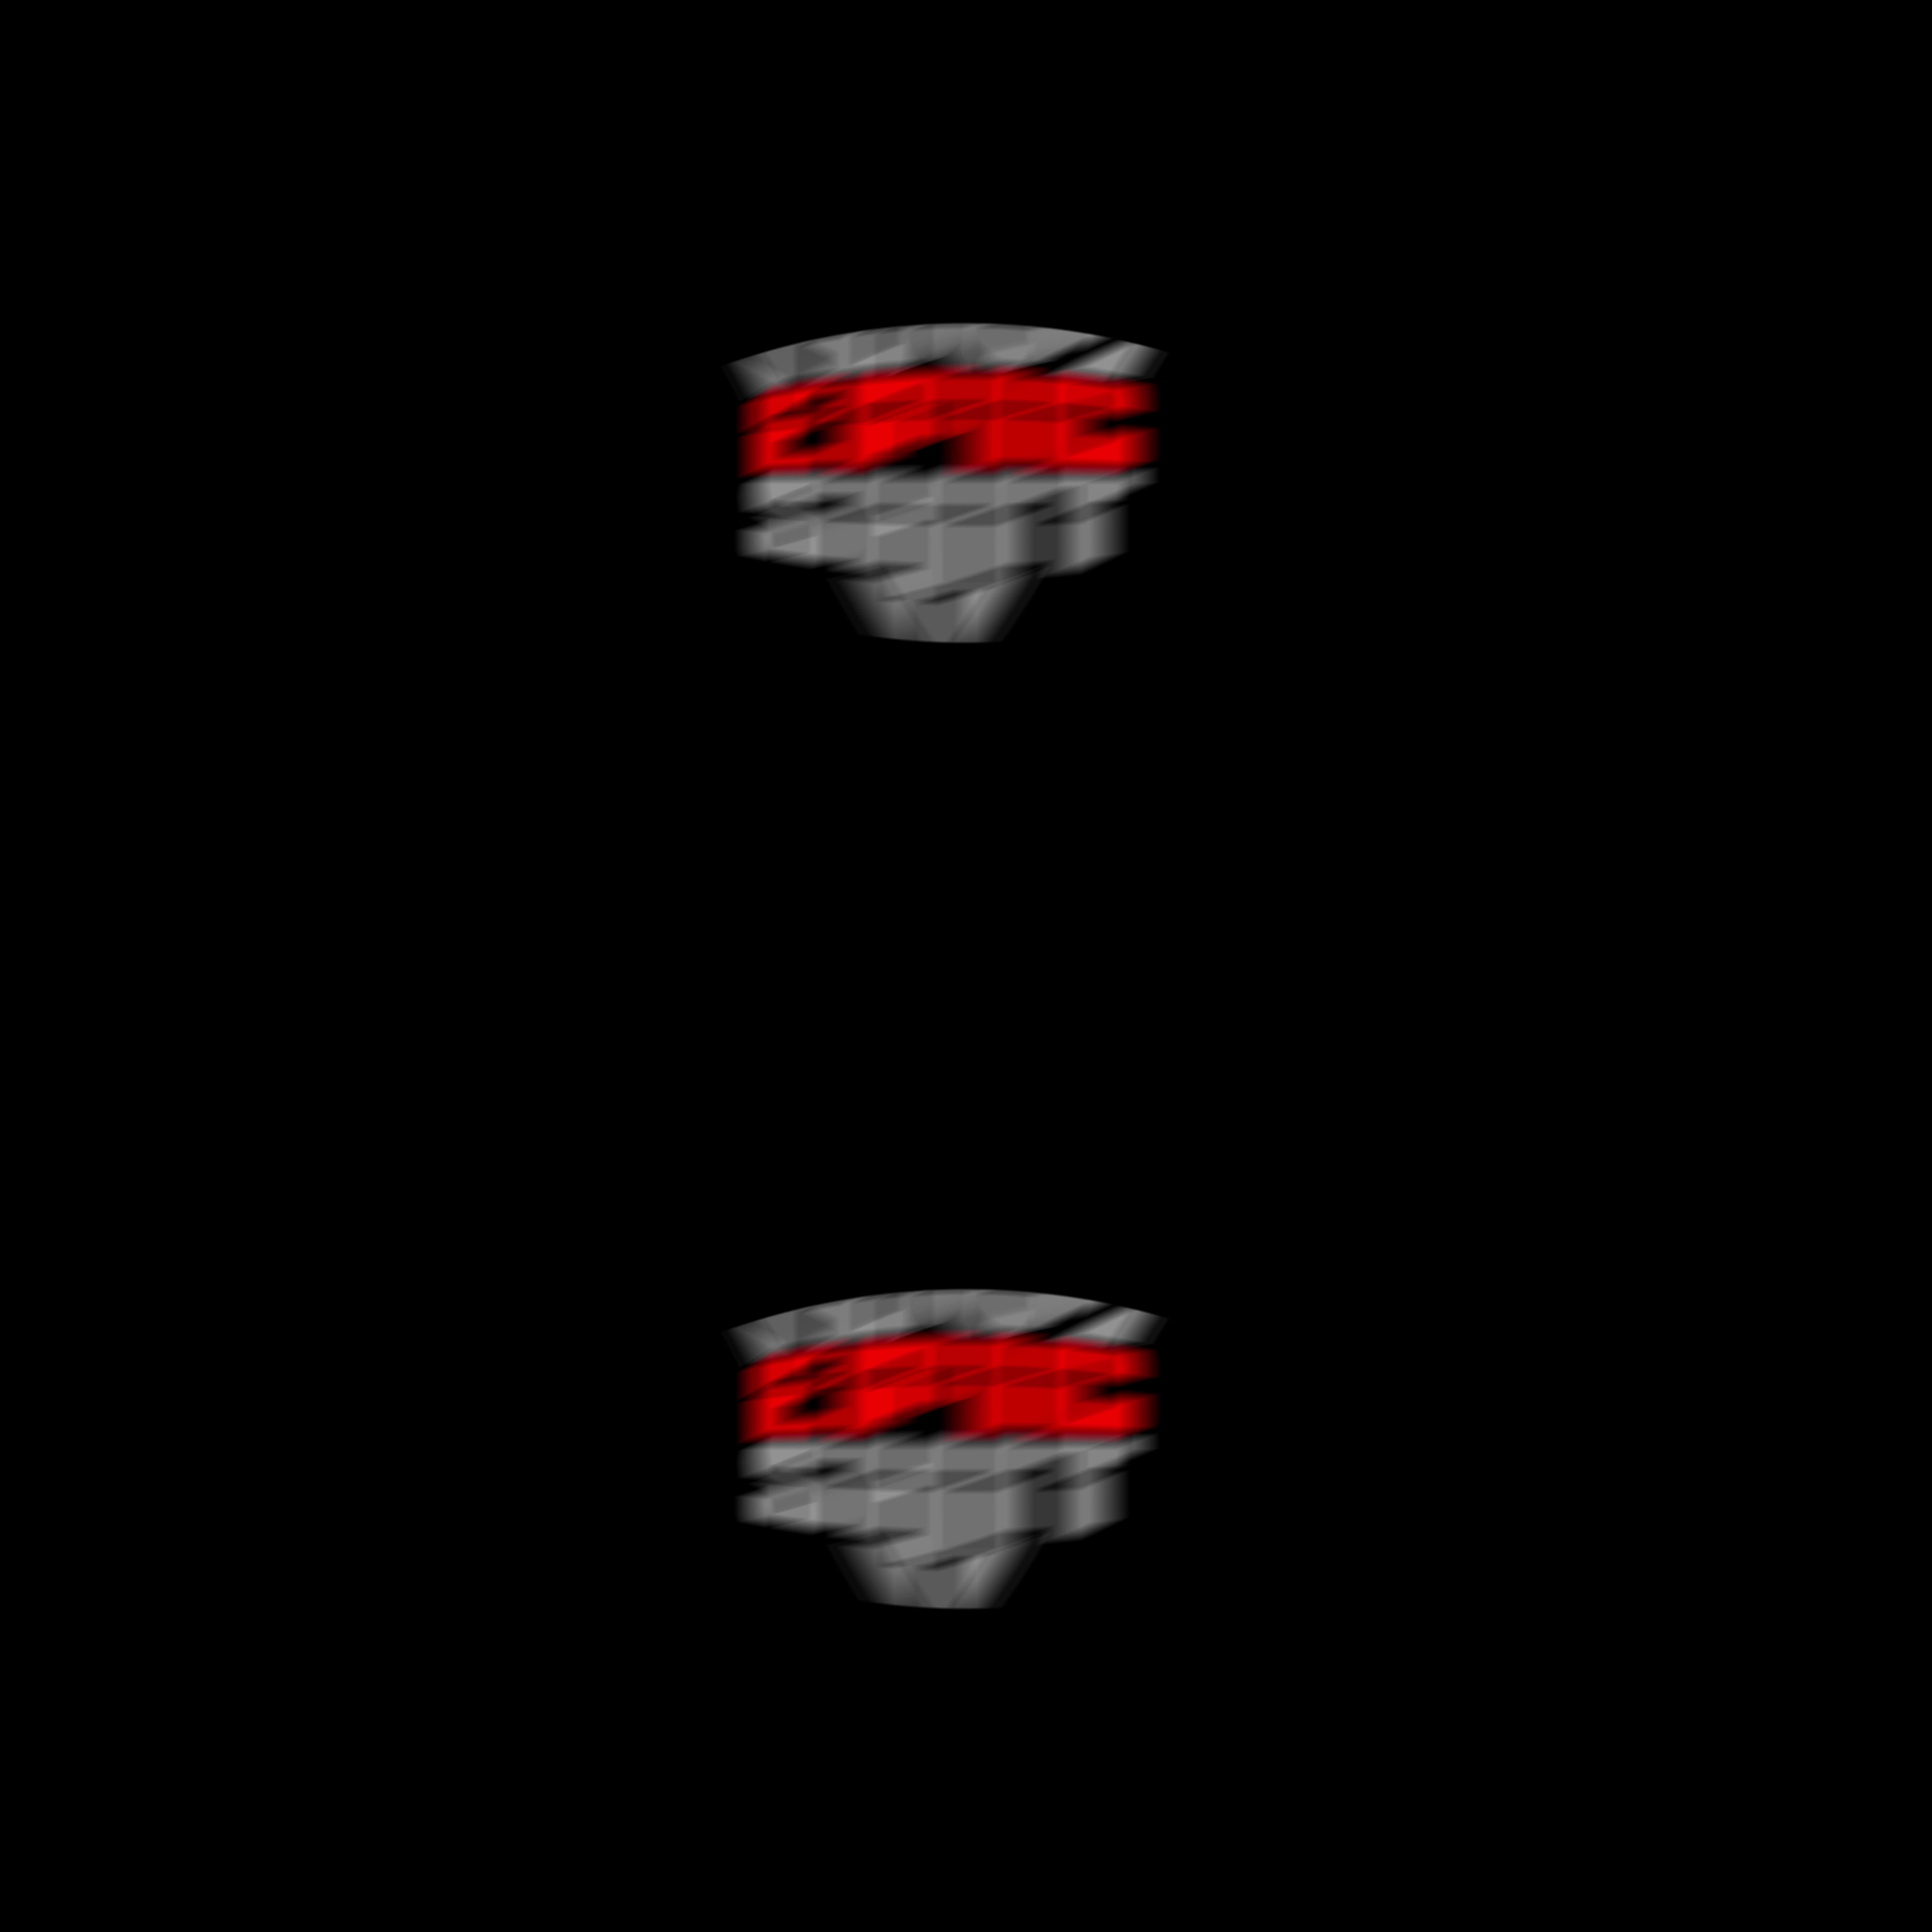 360, 360 Grad, 360 video, 360°, 360° Stuntriding |Supermoto vs. Sportbike|, Kenny STuntriding, Sportbike, Stahlwerk, Stuntriding, Supermoto, VR, Wheelies, virtual reality, vr video, 360° Stuntriding |Supermoto vs. Sportbike| GIFs